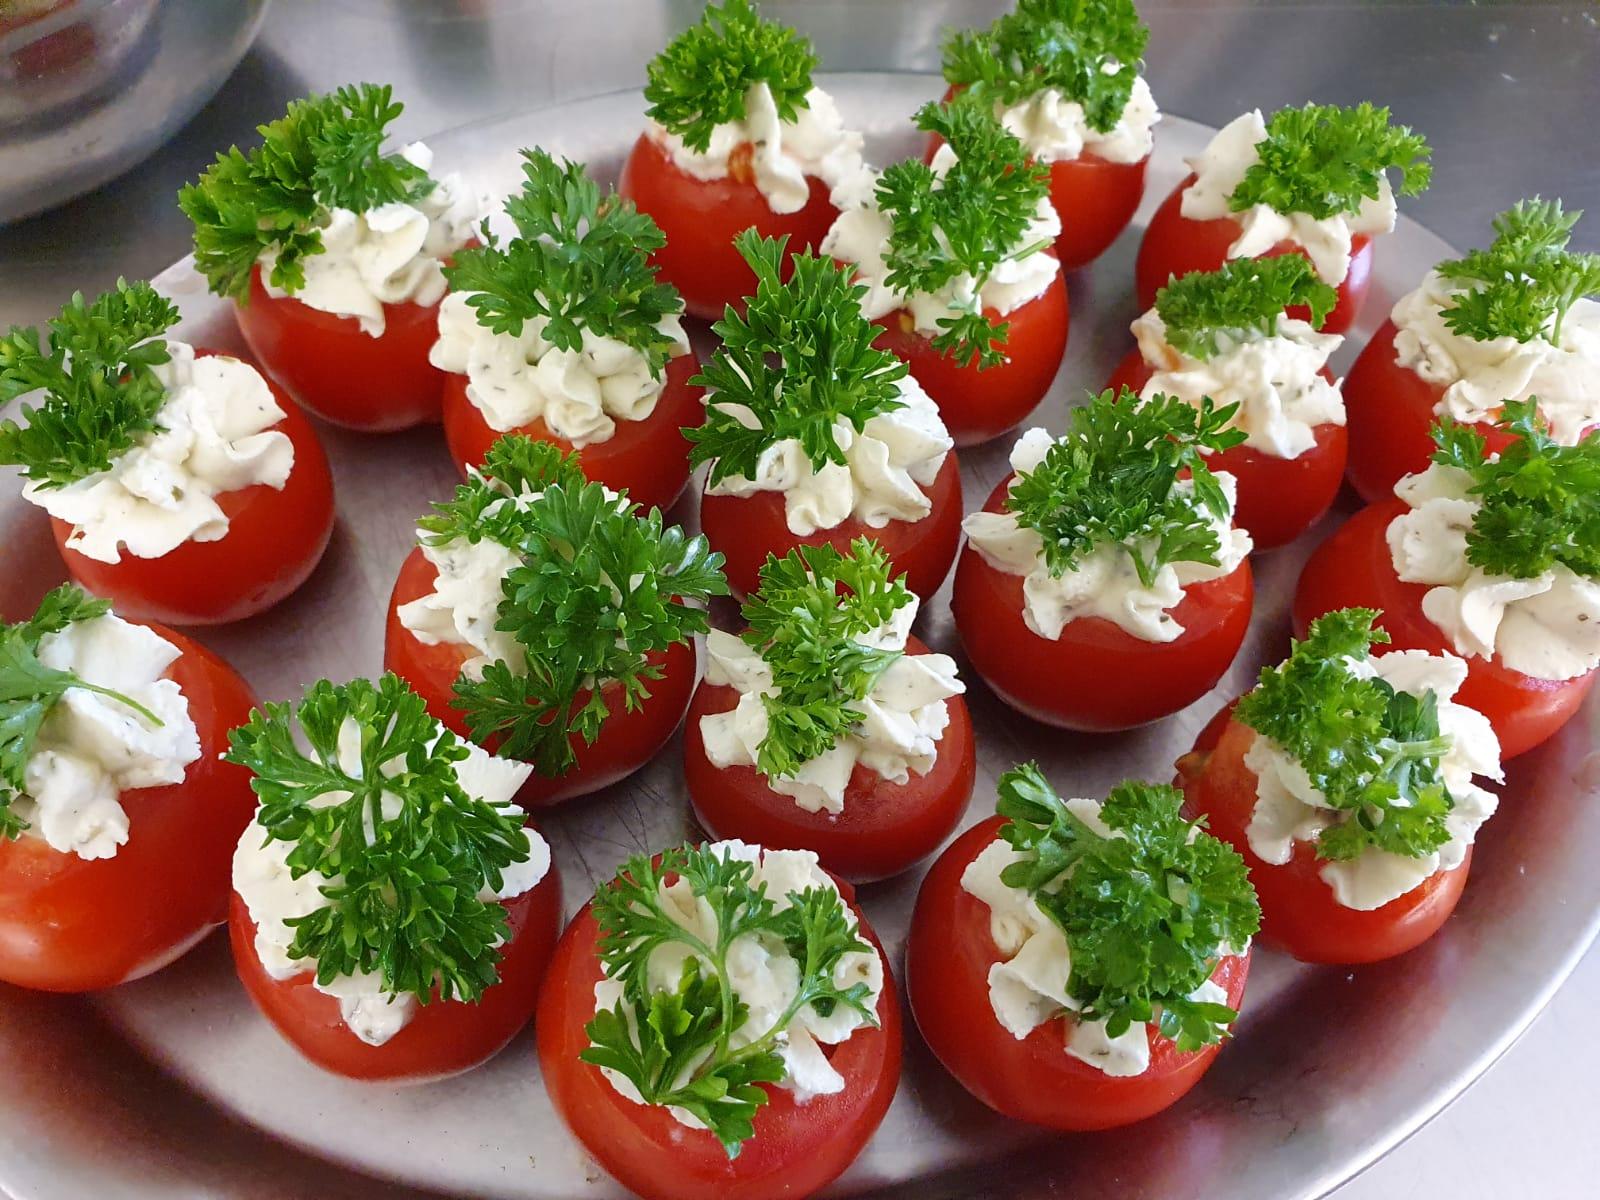 Gefüllte Tomate mit Kräuter-Frischkäse